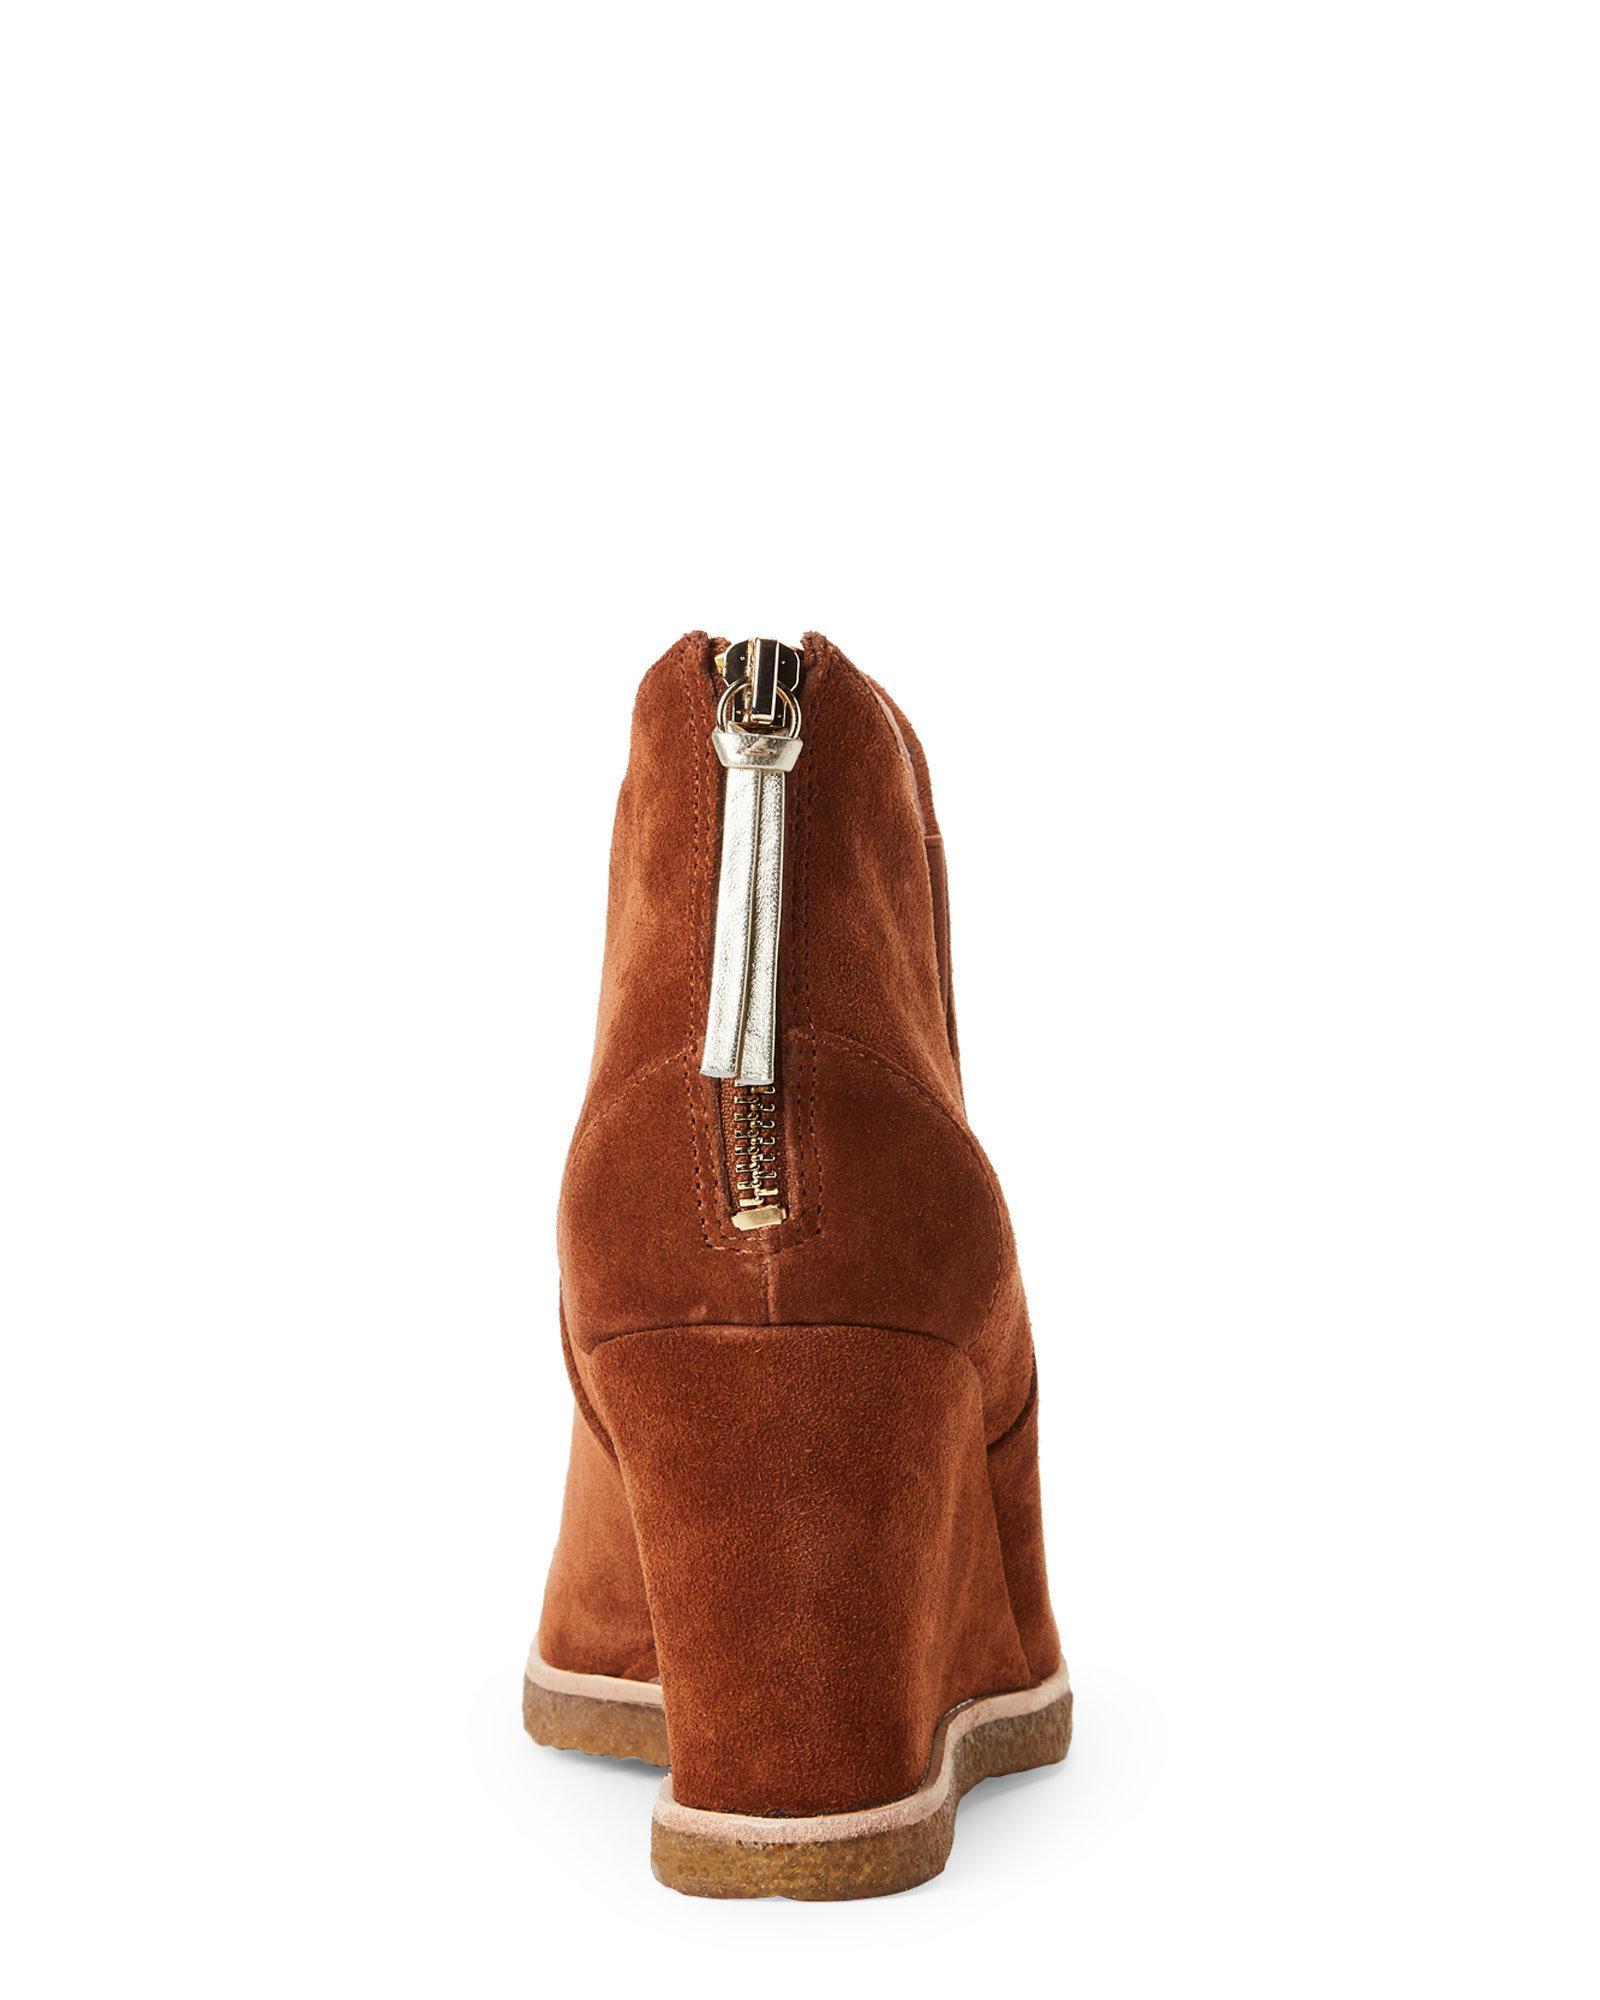 c8f56a85fdf Lyst - Bettye By Bettye Muller Whiskey Zap Wedge Booties in Brown